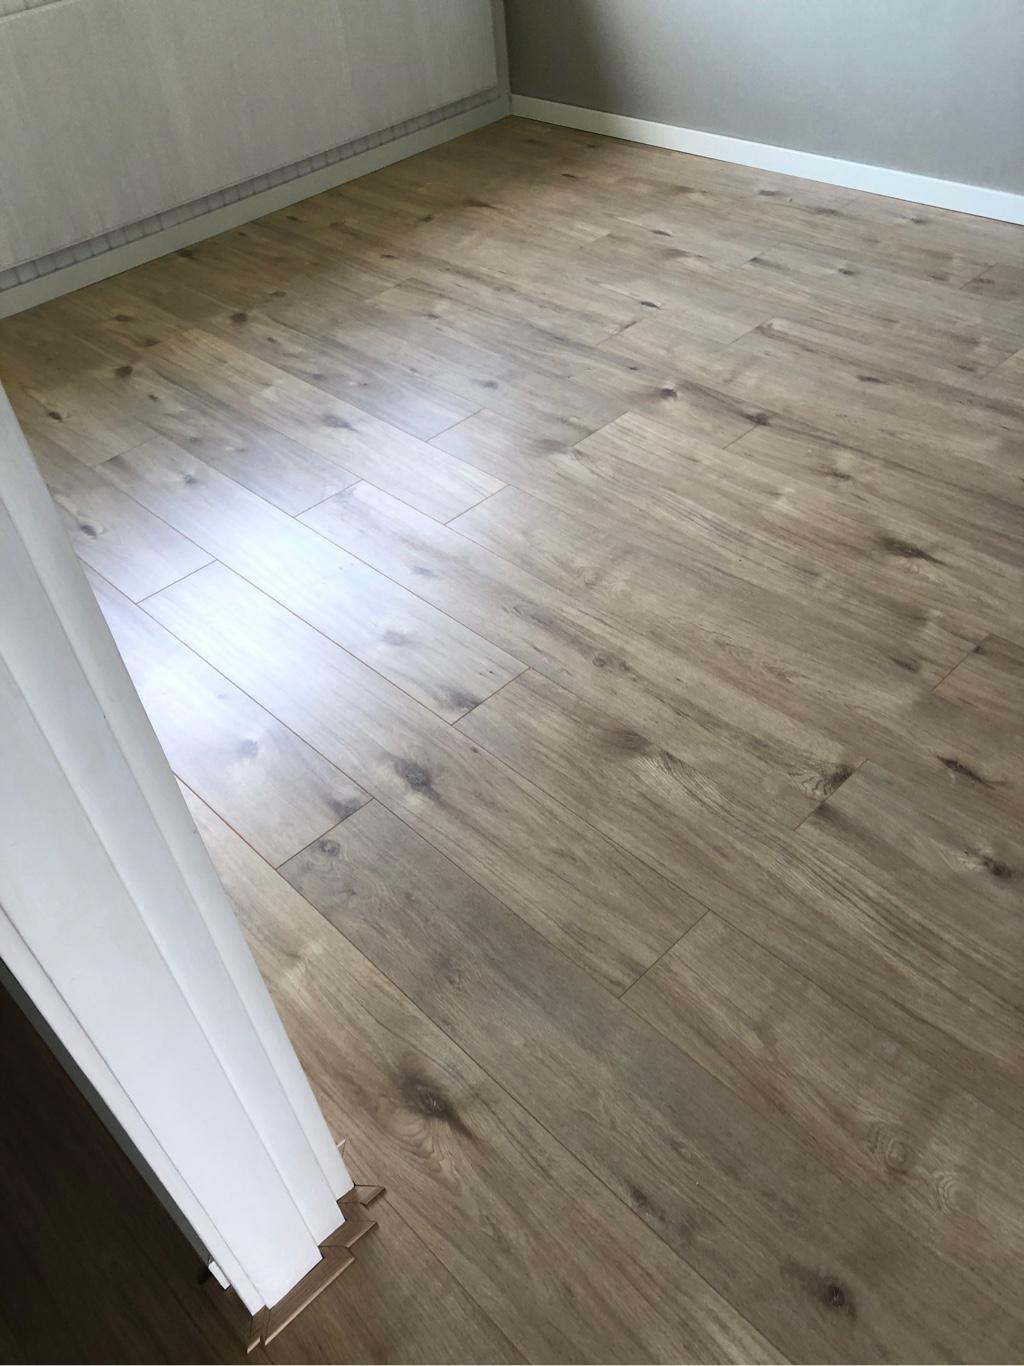 70 m² Achensee Eik + 50 m² Eurus Oak te Hellevoetsluis